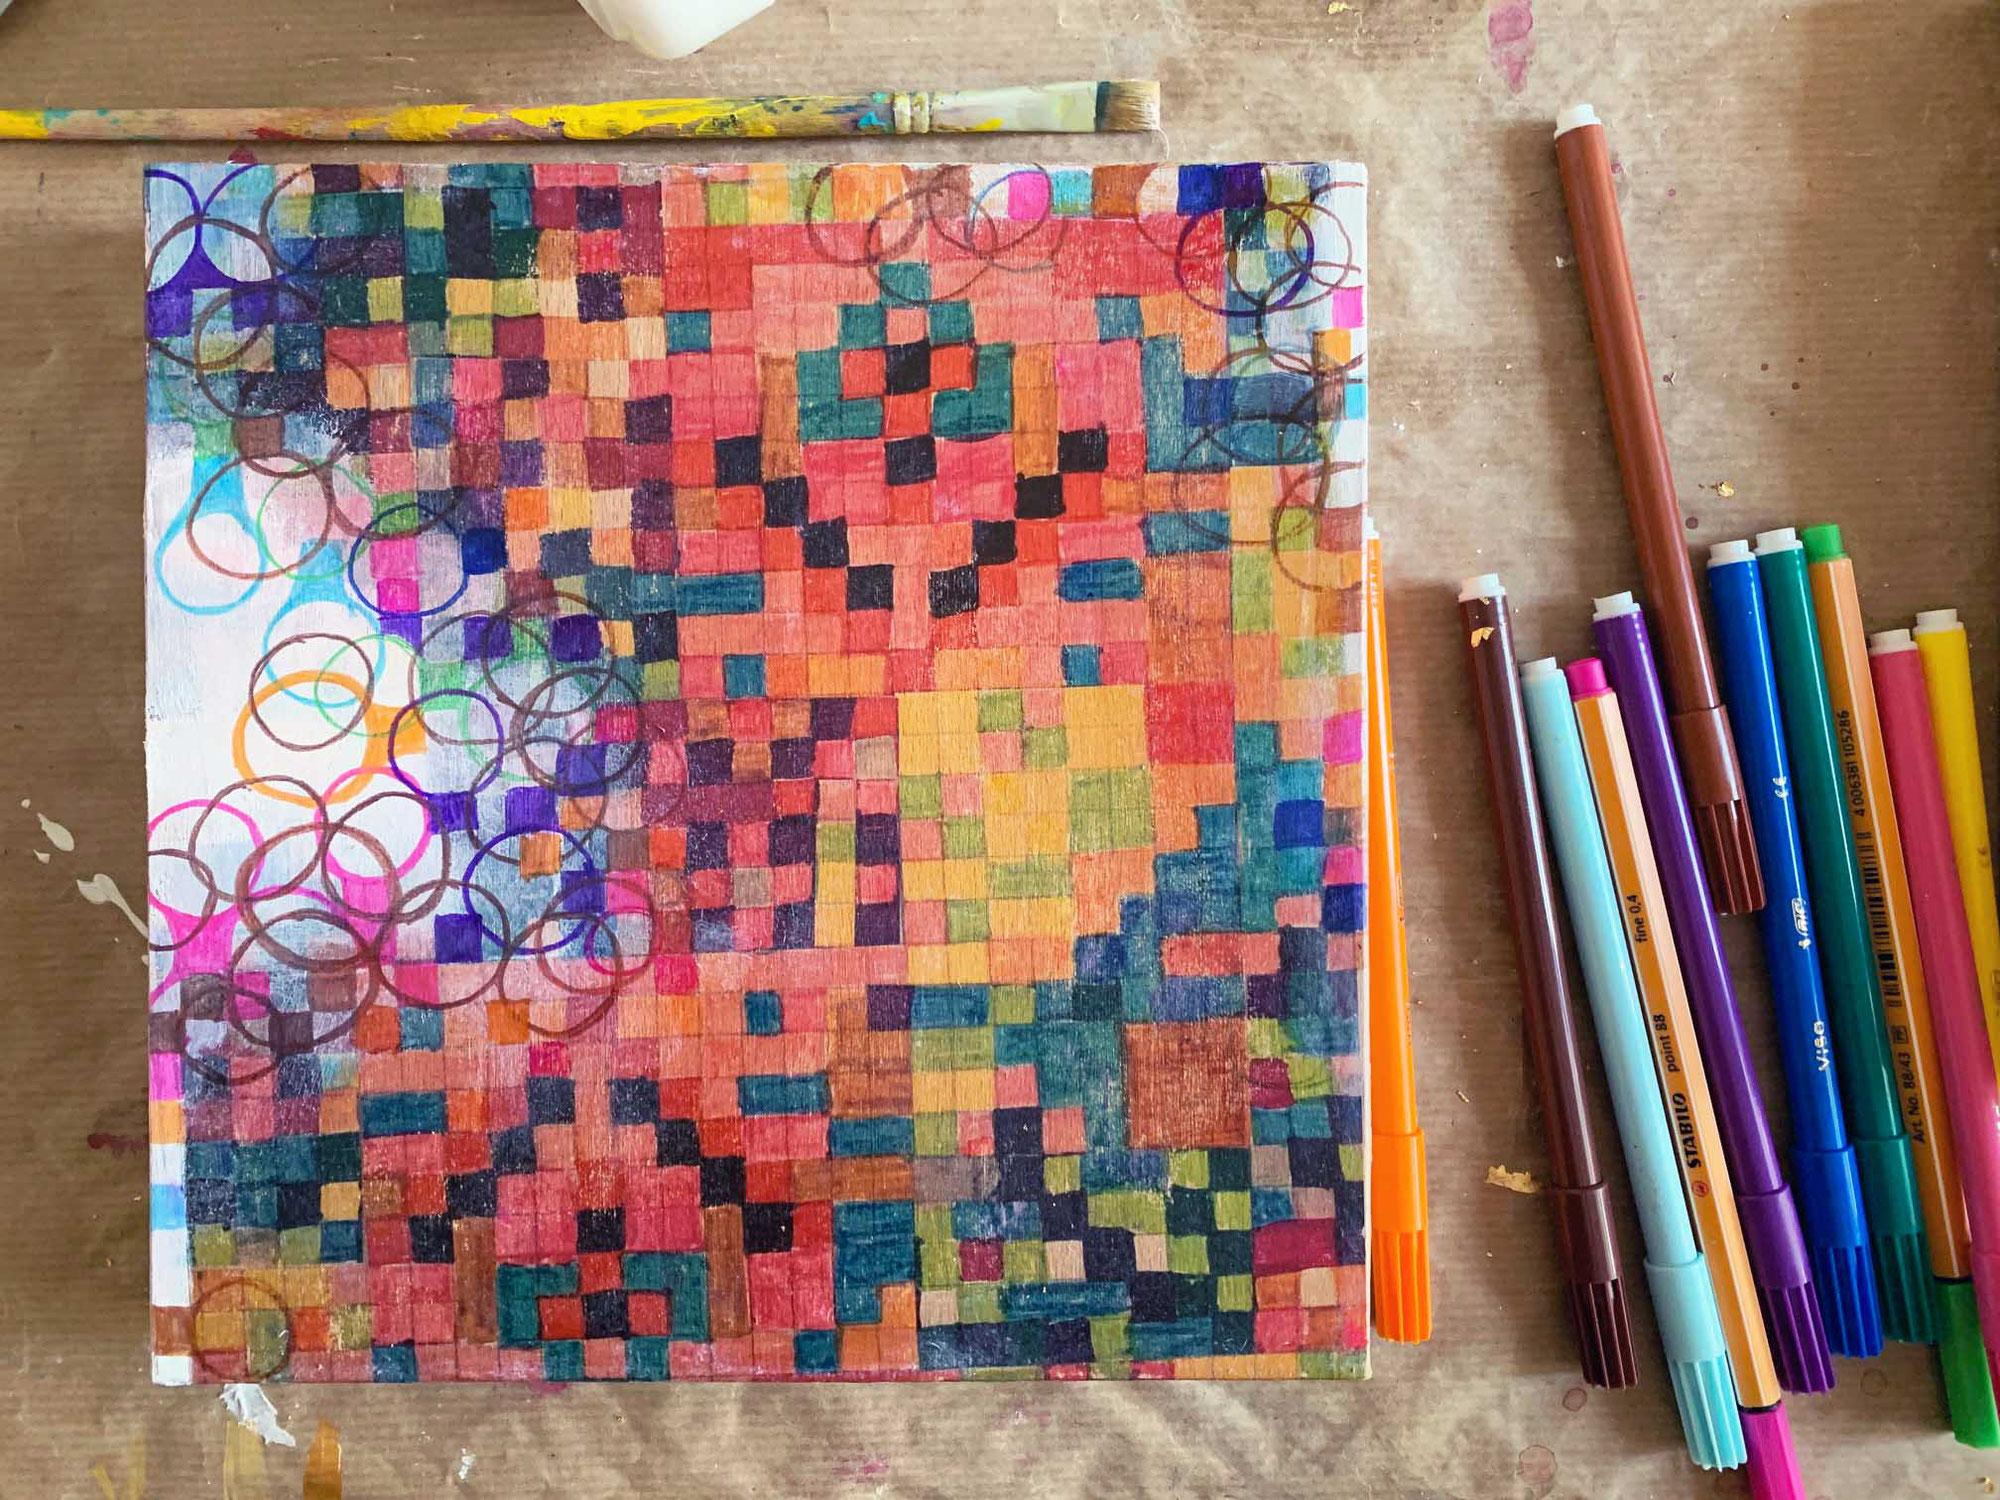 Farbfeldmalerei - bunte Muster malen